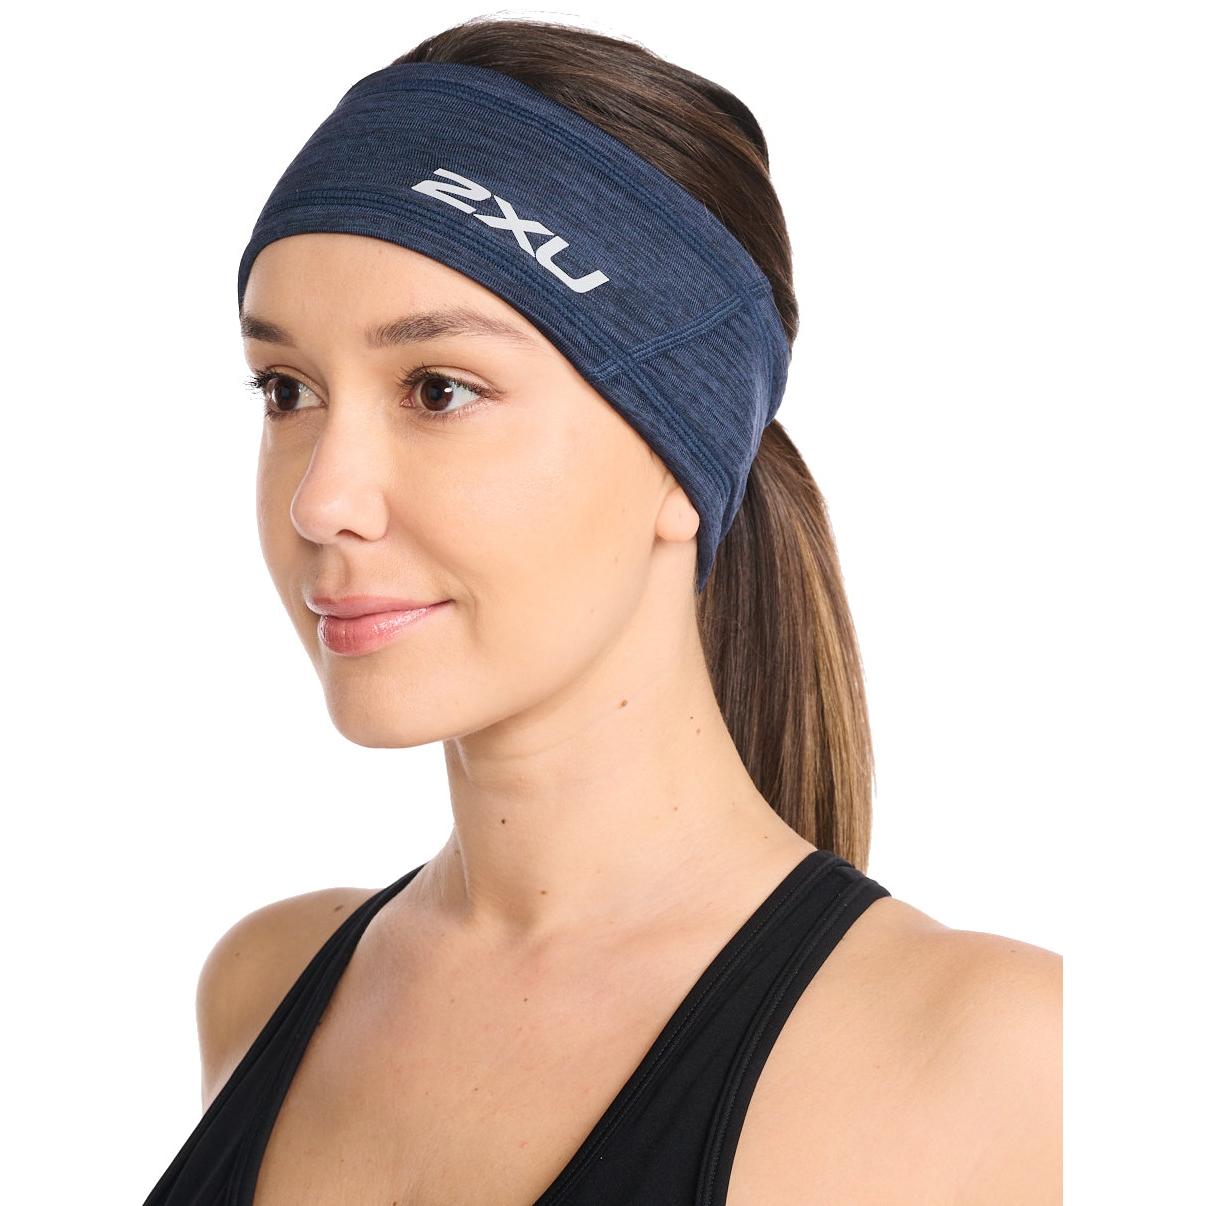 2XU Ignition Headwear Stirnband - midnight/silver reflective